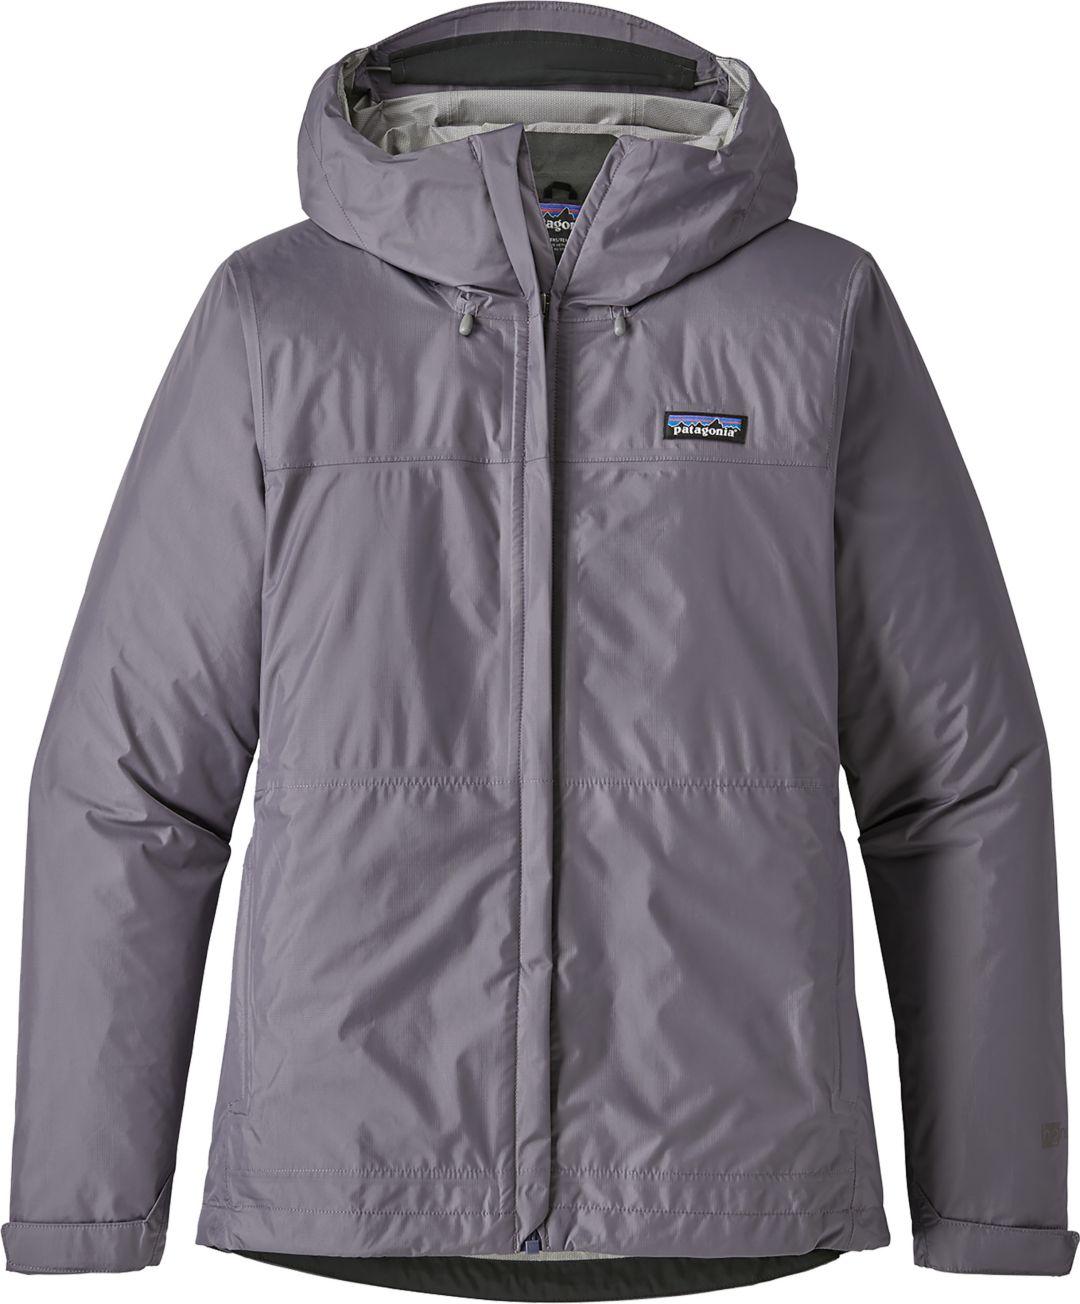 2c6ec737773b2 Patagonia Women's Torrentshell Rain Jacket | DICK'S Sporting Goods